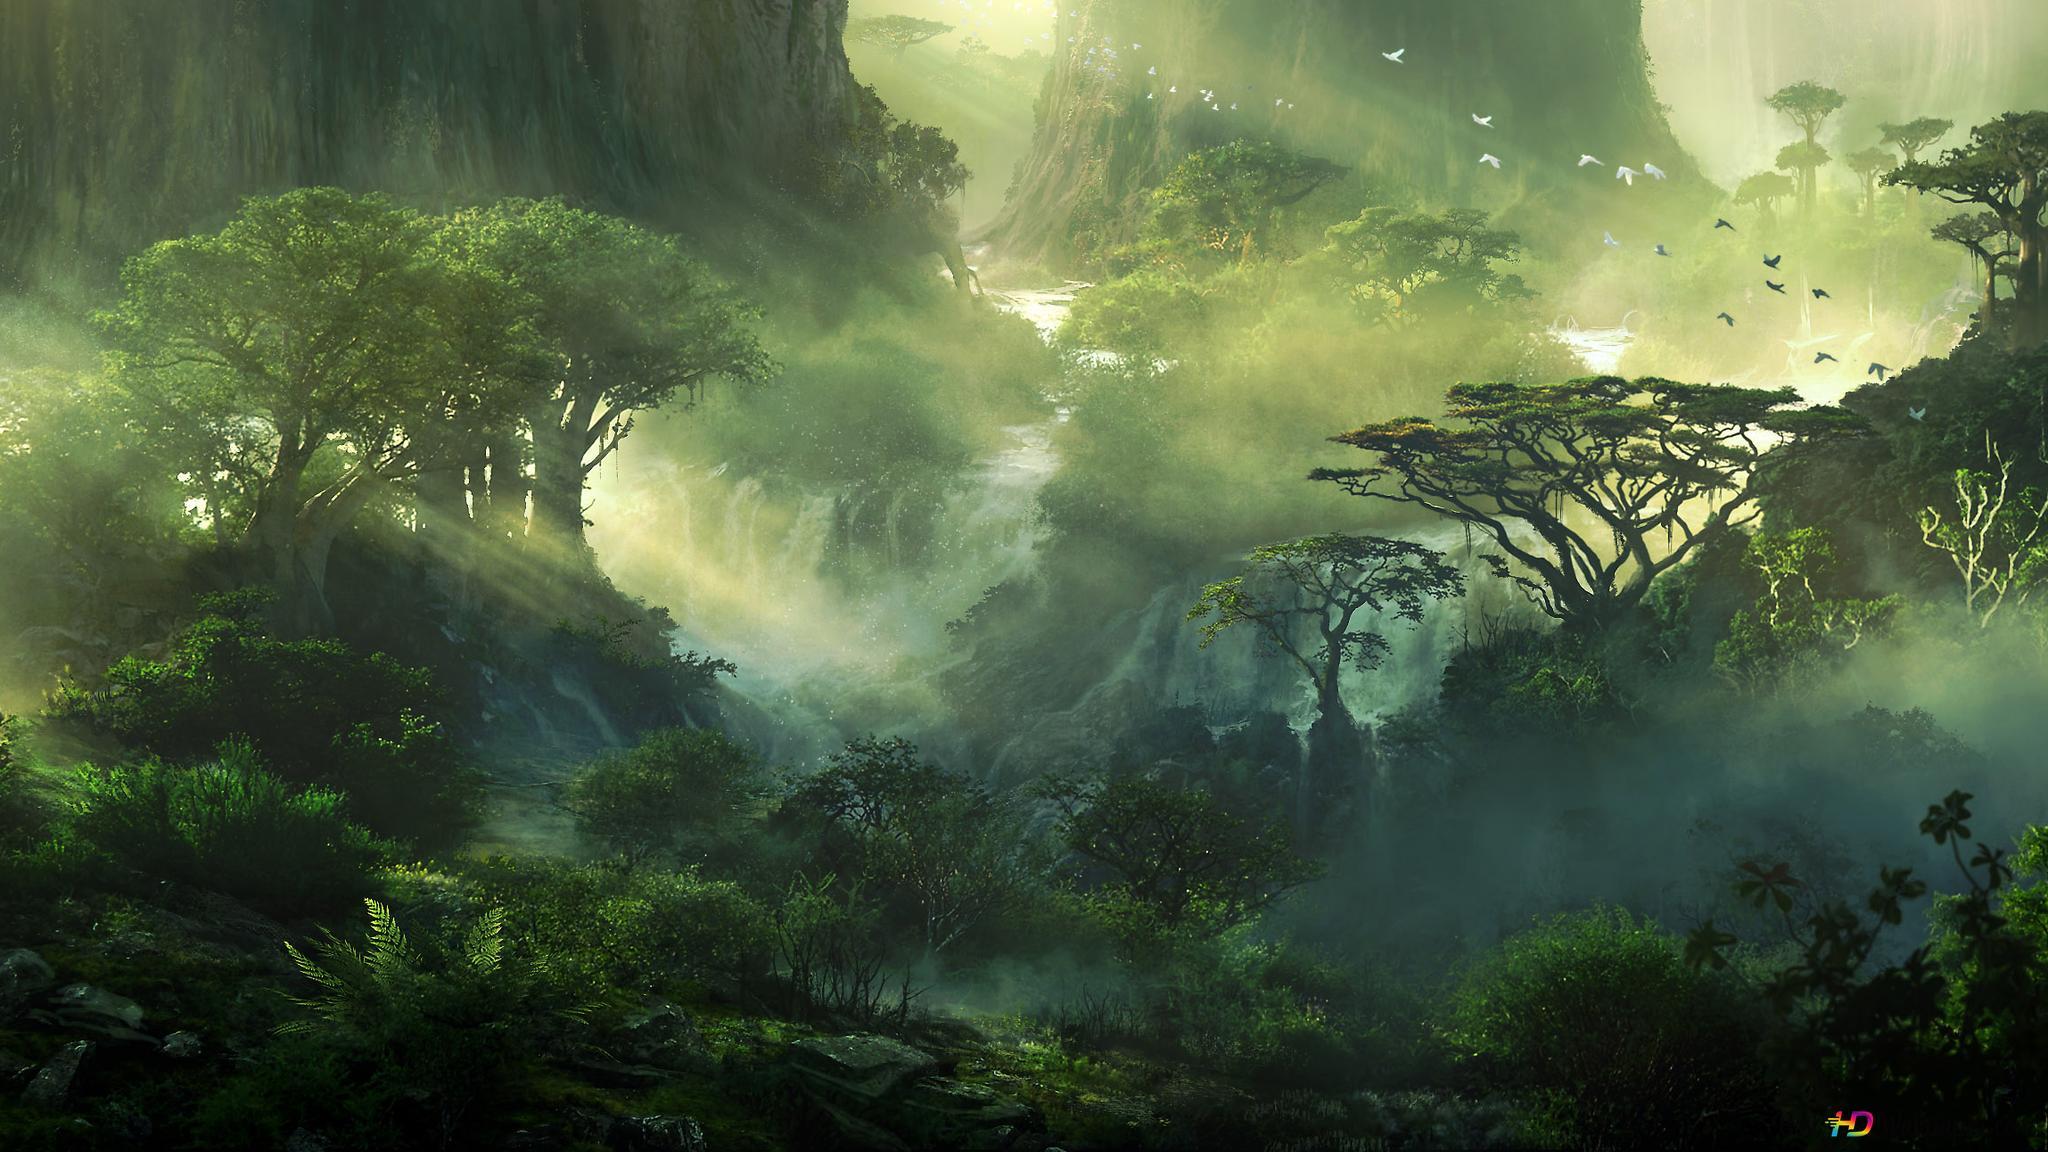 Fantasy Jungle Waterfalls Hd Wallpaper Download